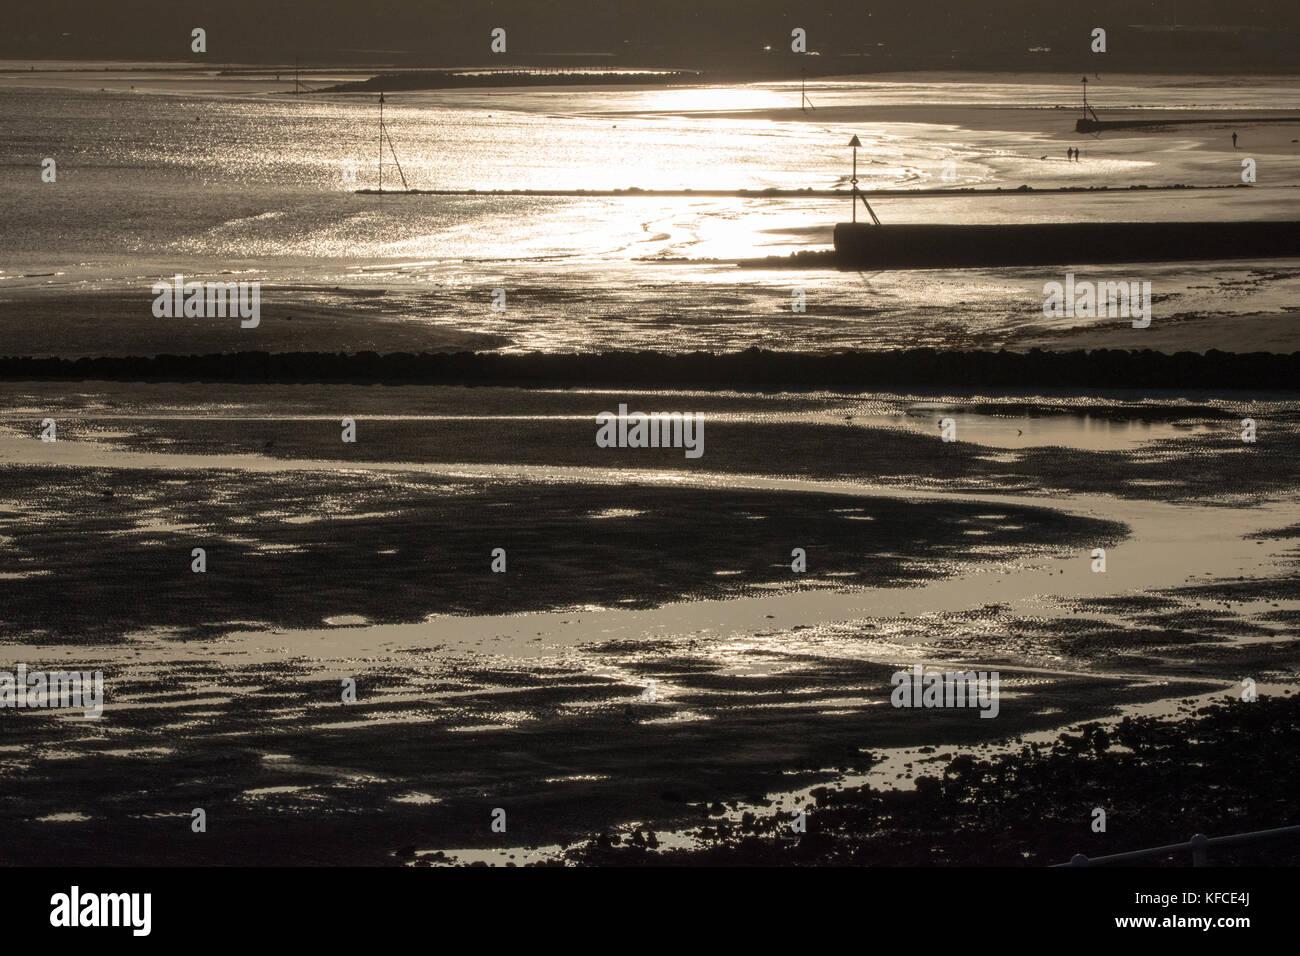 Colwyn Bay Beach - Stock Image